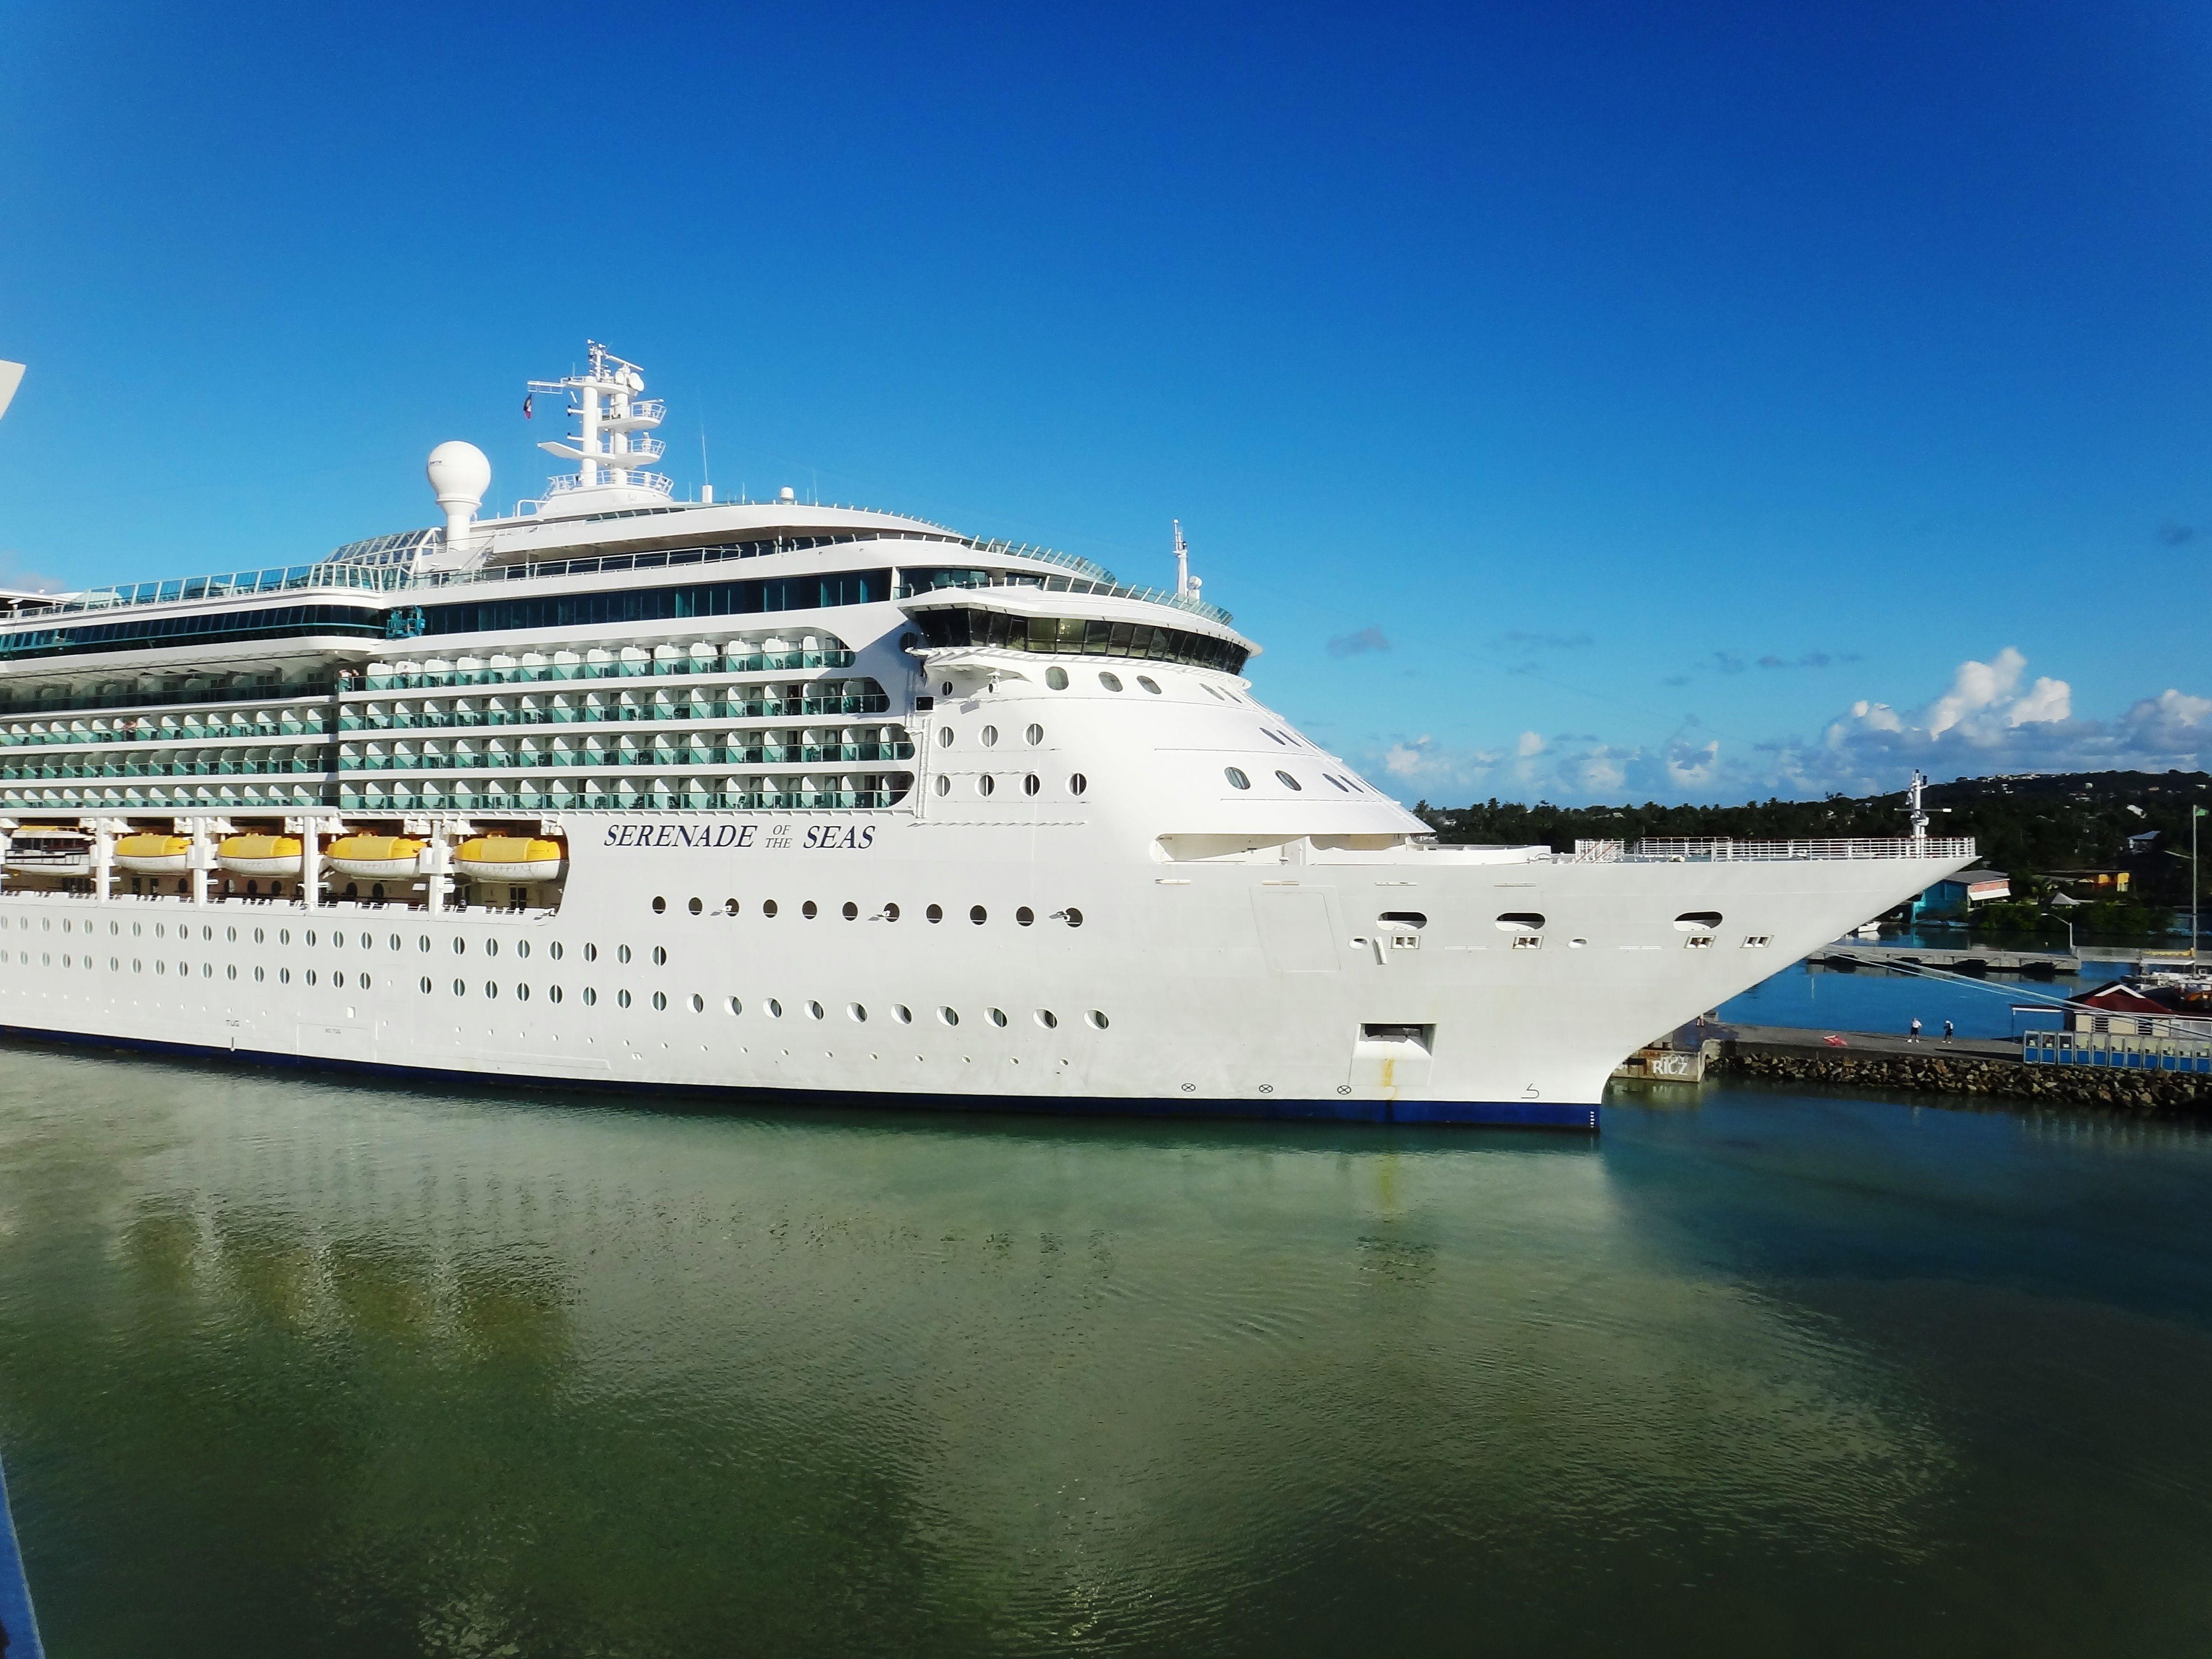 royal caribbean 39 s cruise ship serenade of the seas